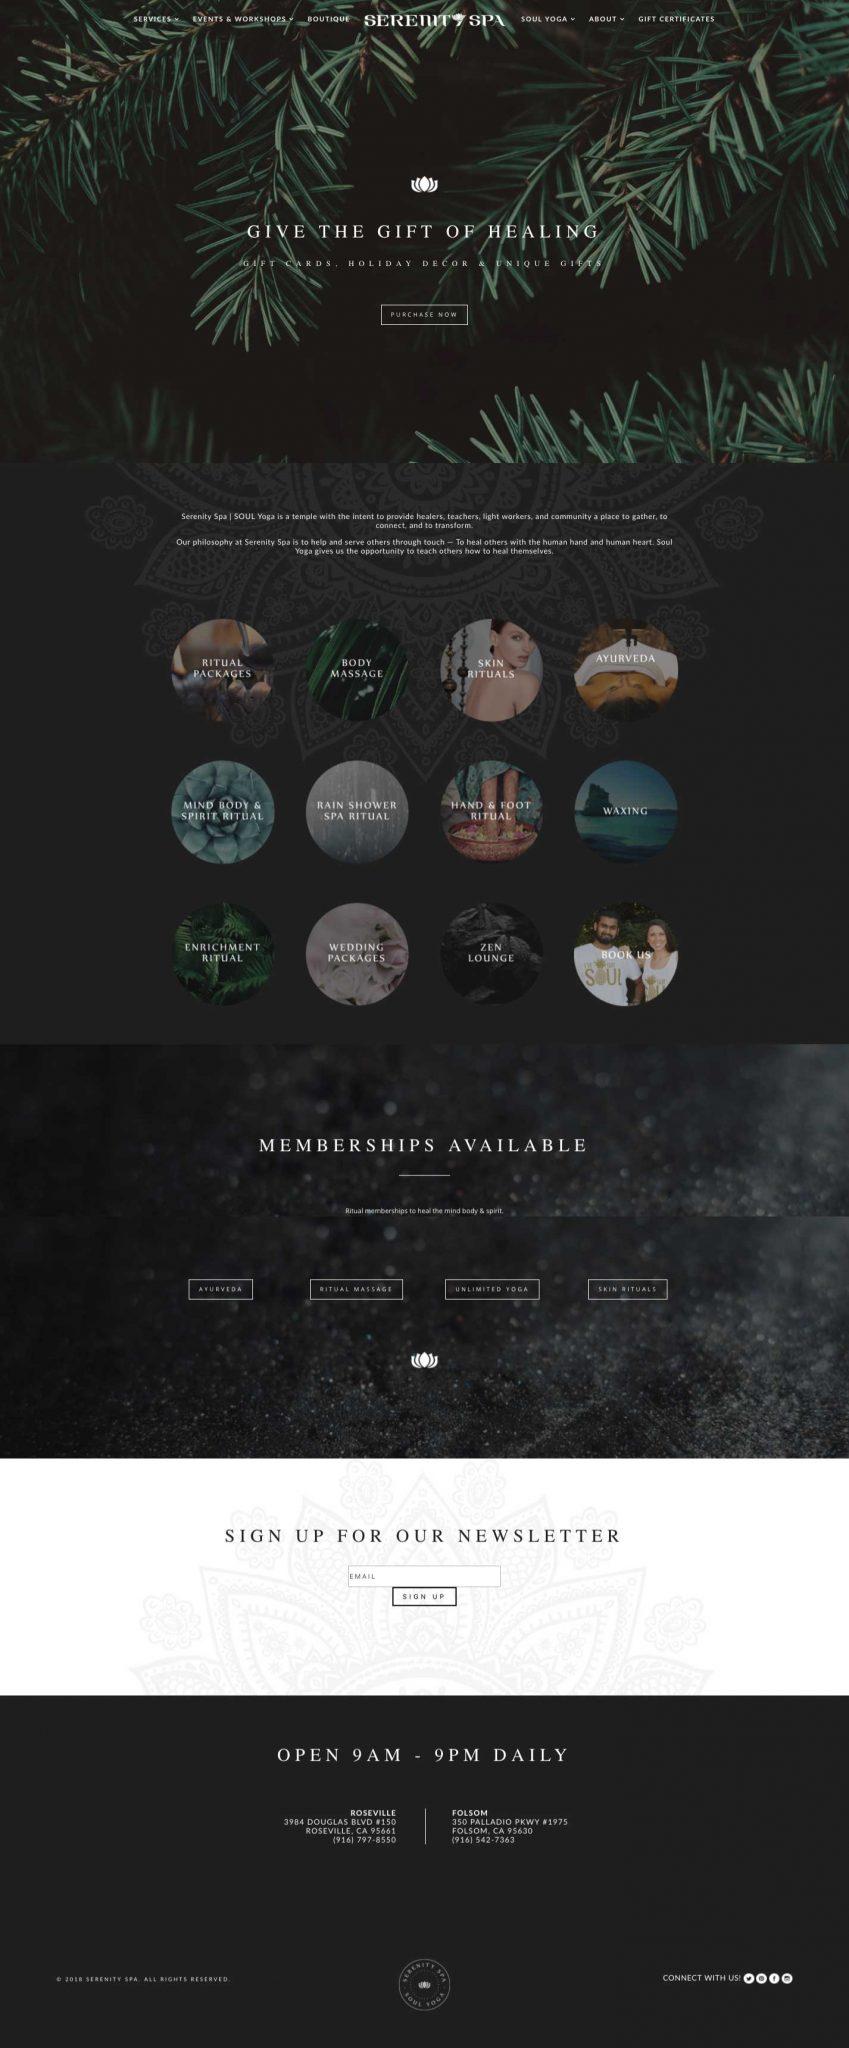 serenityspaonline.com_ Standalone Pricing